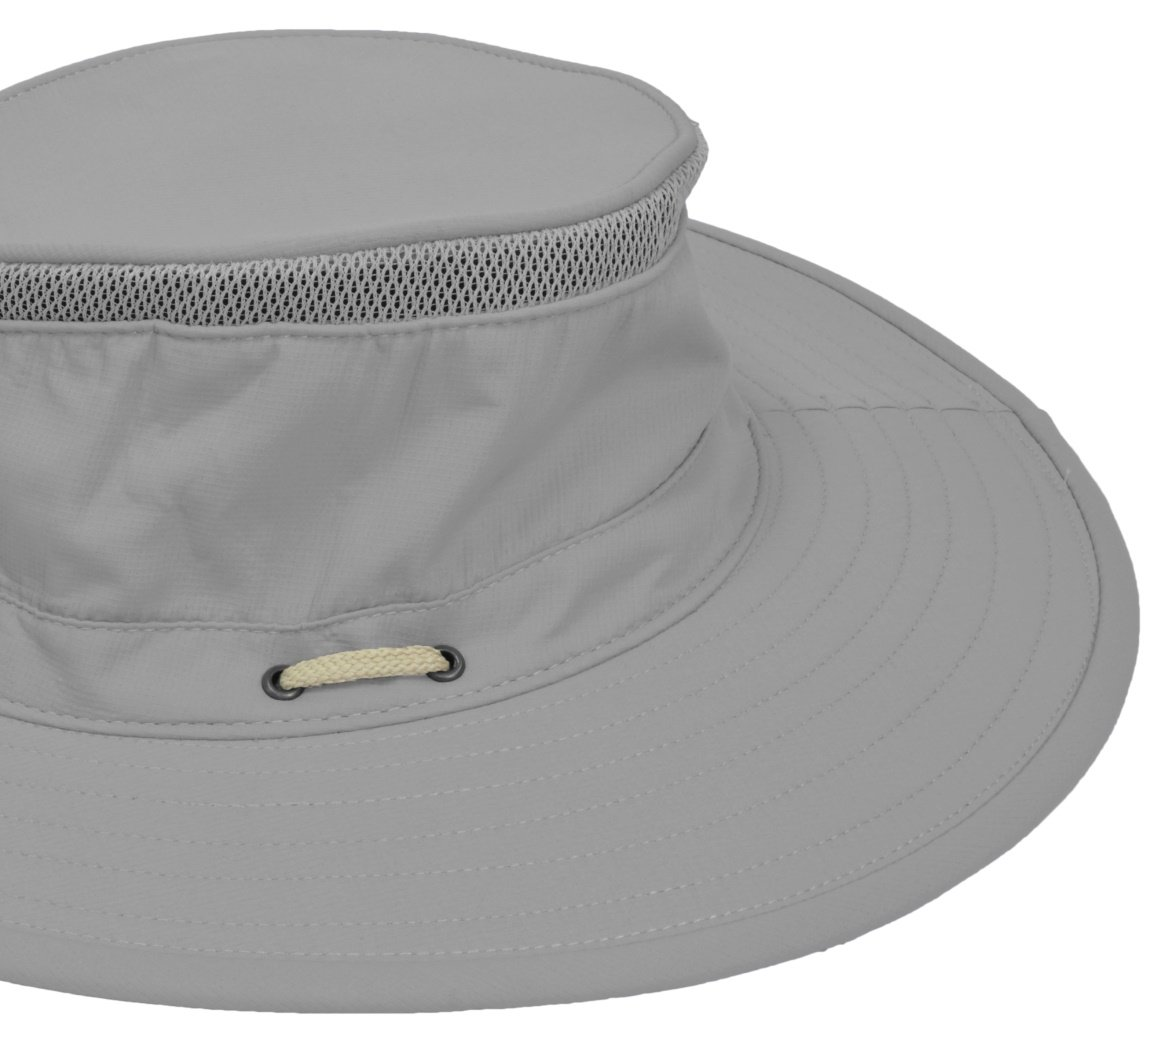 Sun Blocker Unisex Wide Brim Boonie Bucket Sun Hat Outdoor Fishing Boating  Safari Hat with Adjustable Drawstring for Small Head ... 82eac145aad